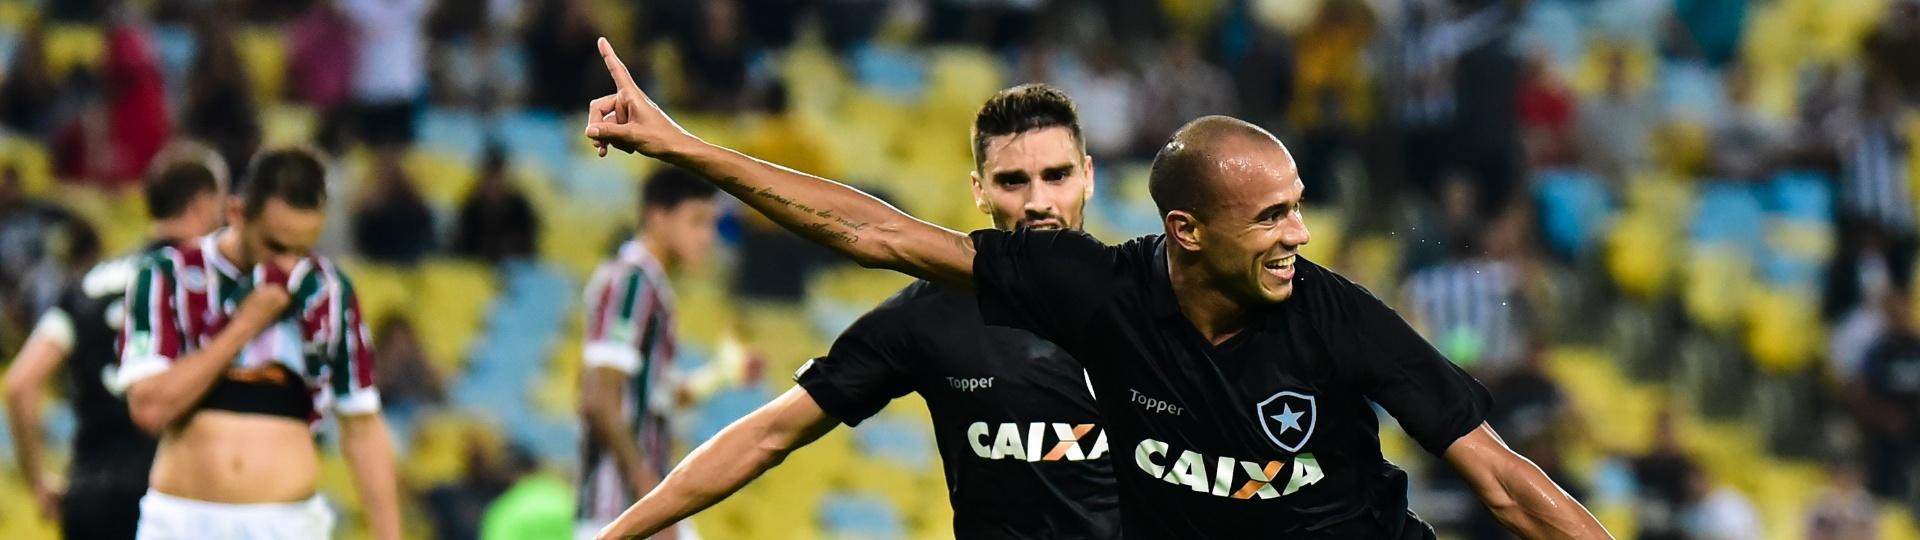 Roger abriu o placar para o Botafogo contra o Fluminense